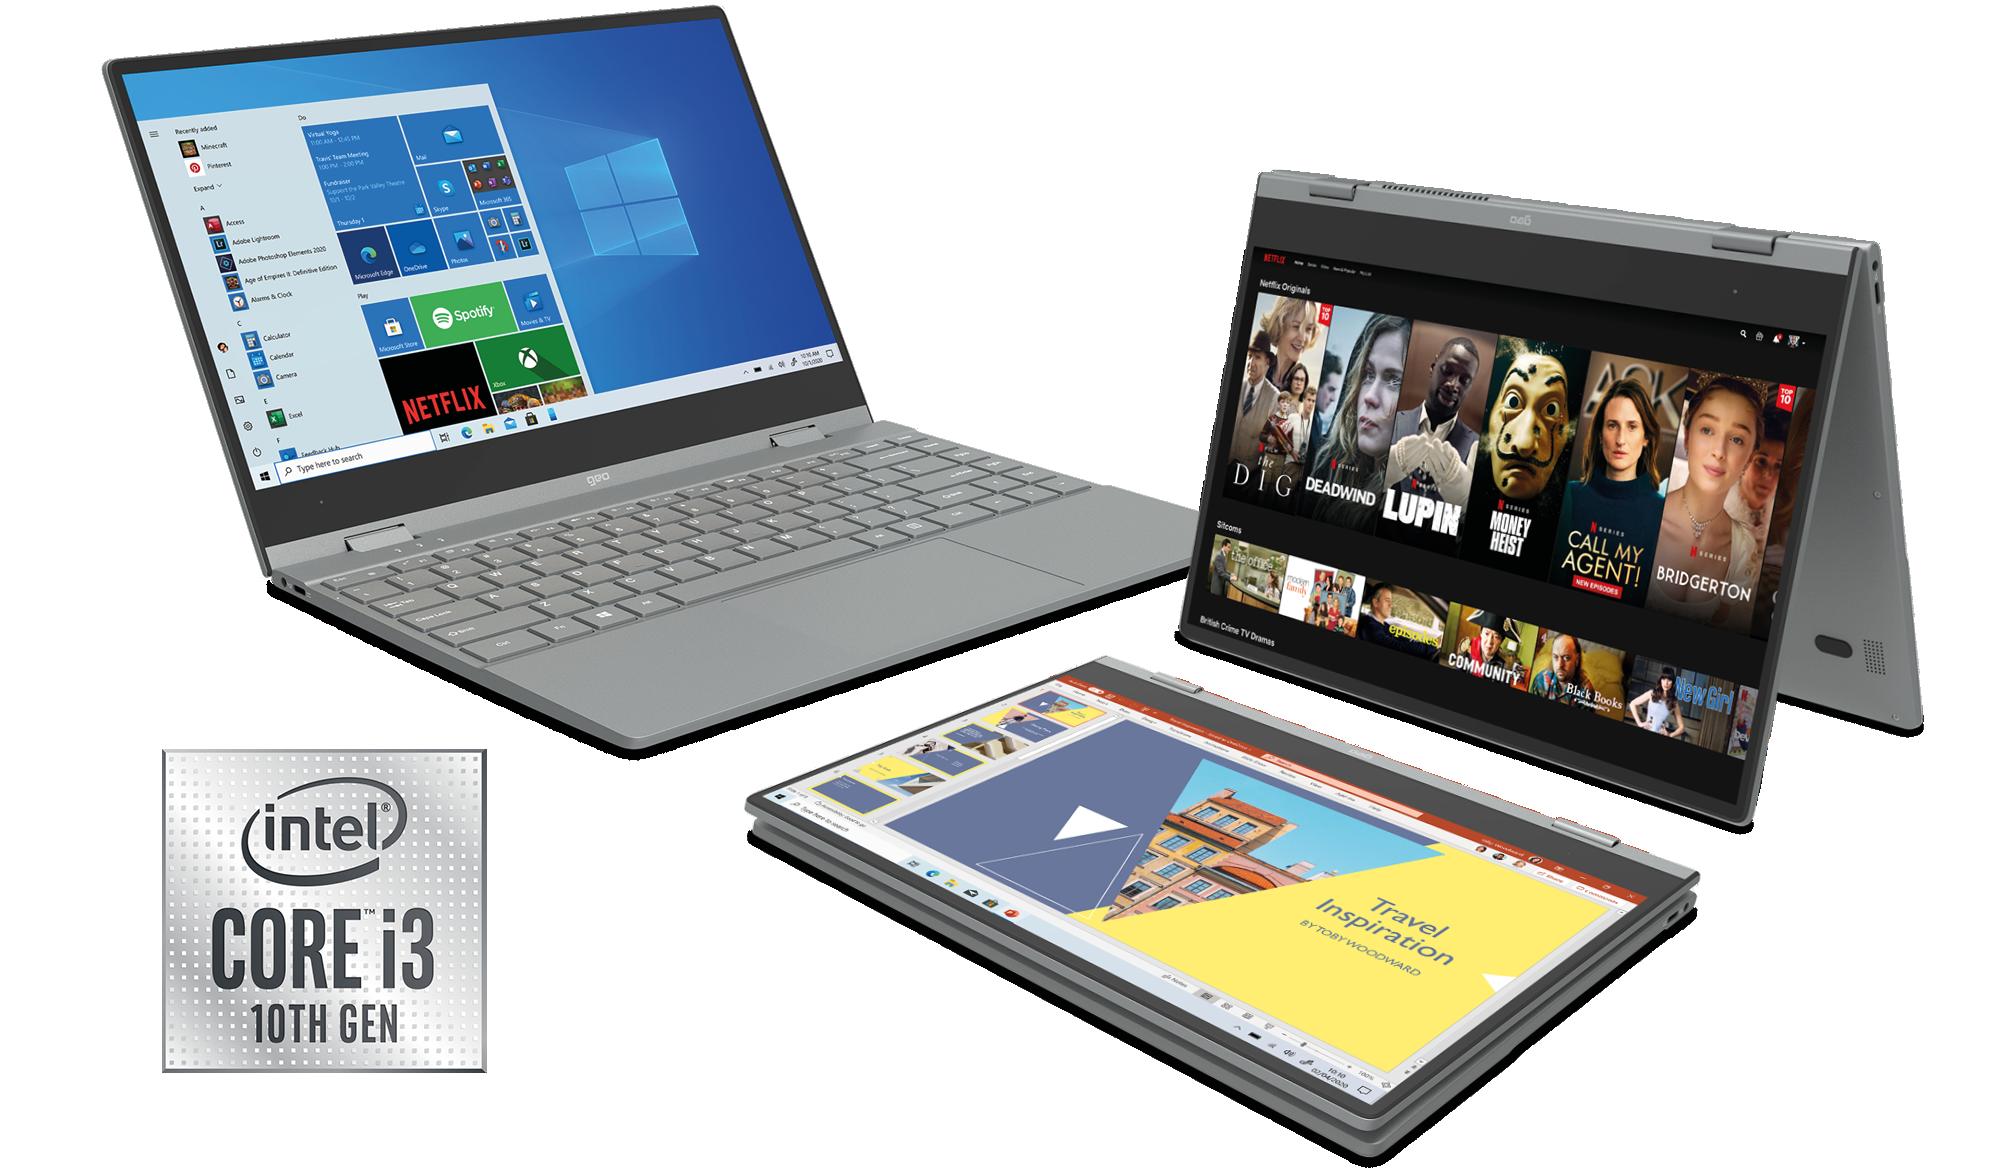 GeoFlex 340 Convertible Laptop